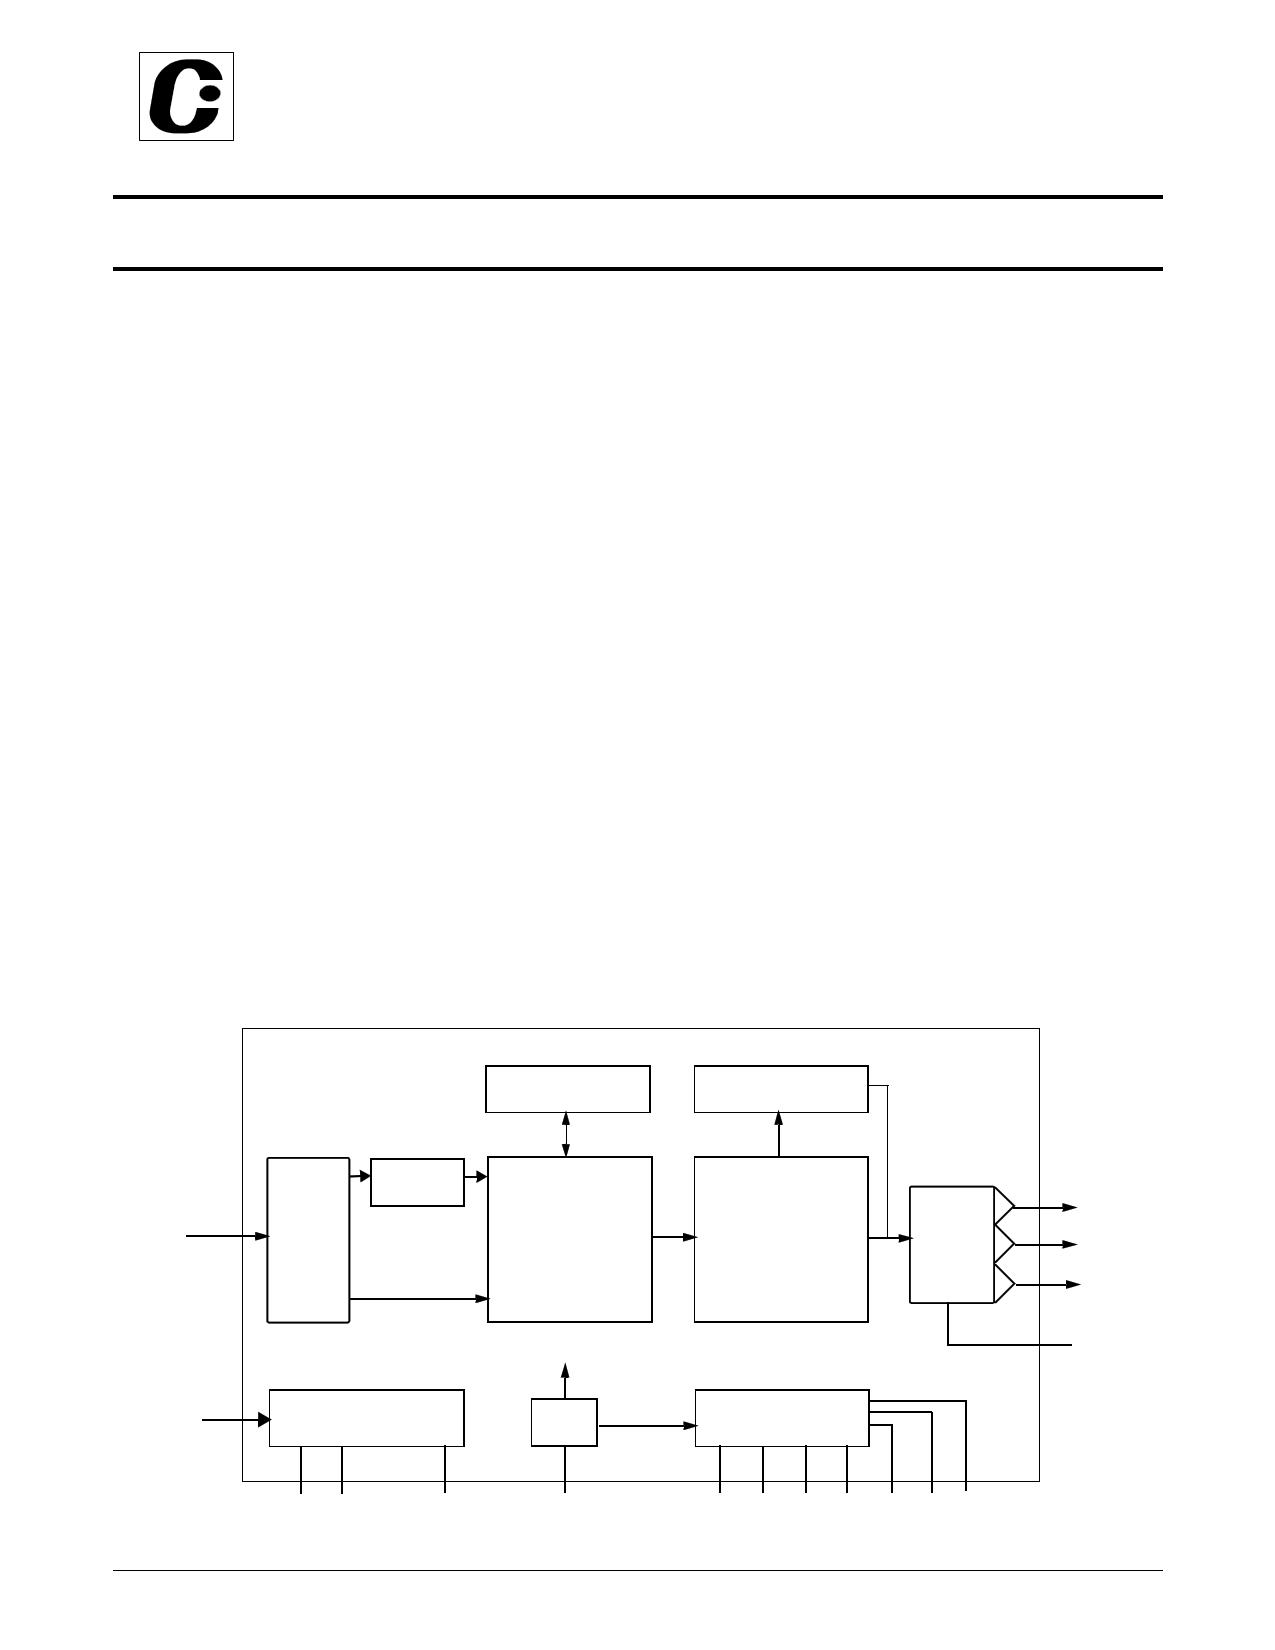 CH7008A-V datasheet